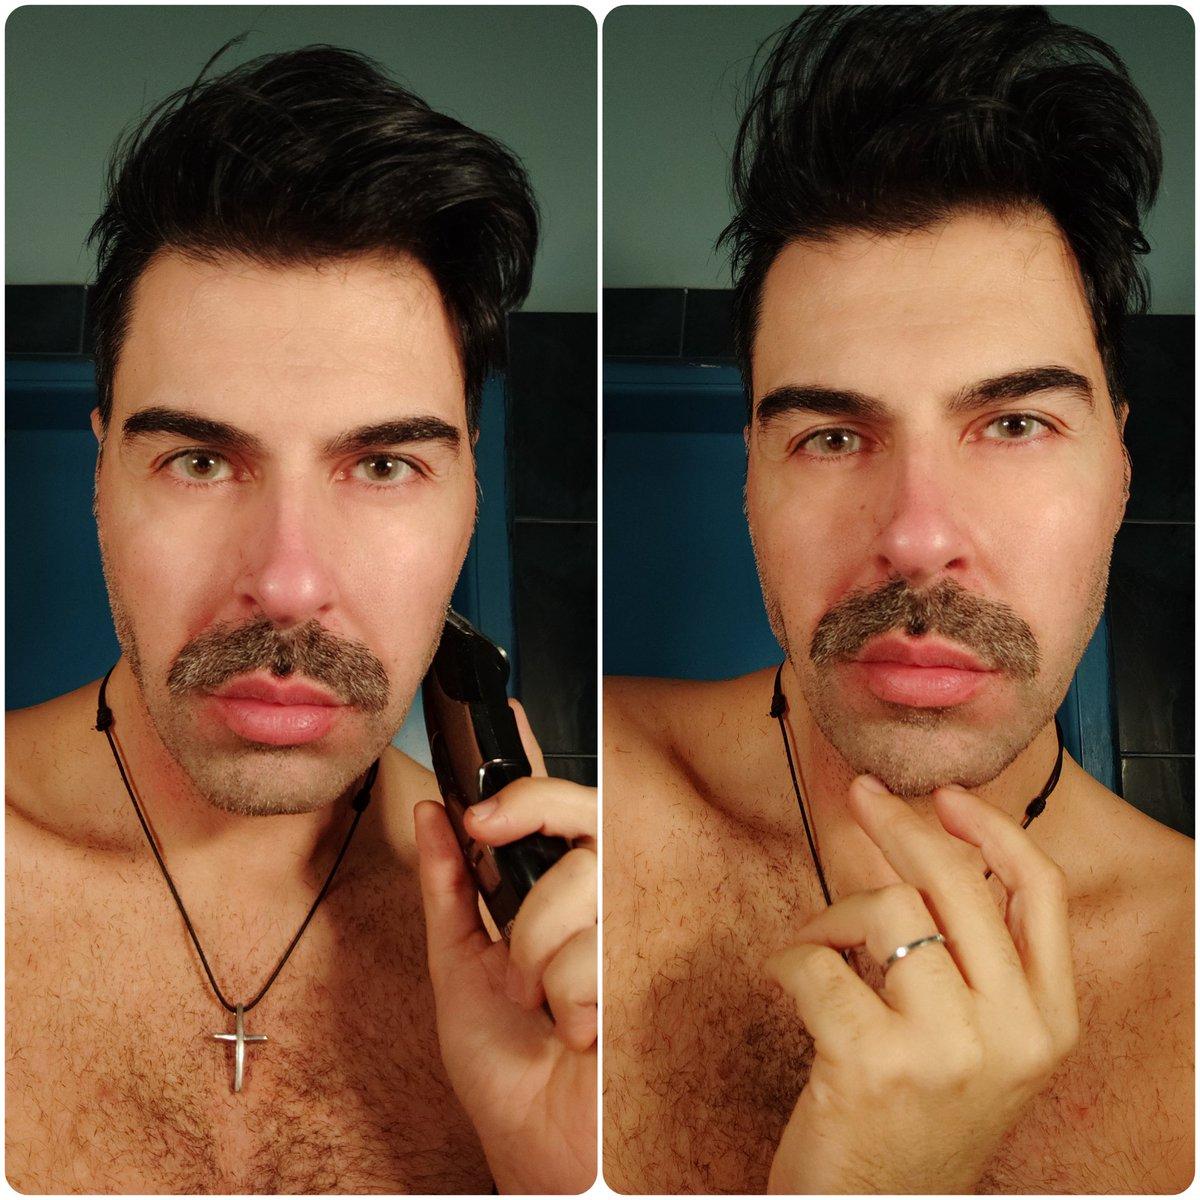 New moustache.... My hard porn beard gone... But it will return soon ;-) Beard is love guys woof!  #xoxo #DerekLiontis 💎🐱🐻🐺🌈 ........................................................... #men #lifestyle #mensworld  #gay #man #gaylifestyle #beargay #gayotter #gaybear #gaywolf https://t.co/1oHvc5Q9ku